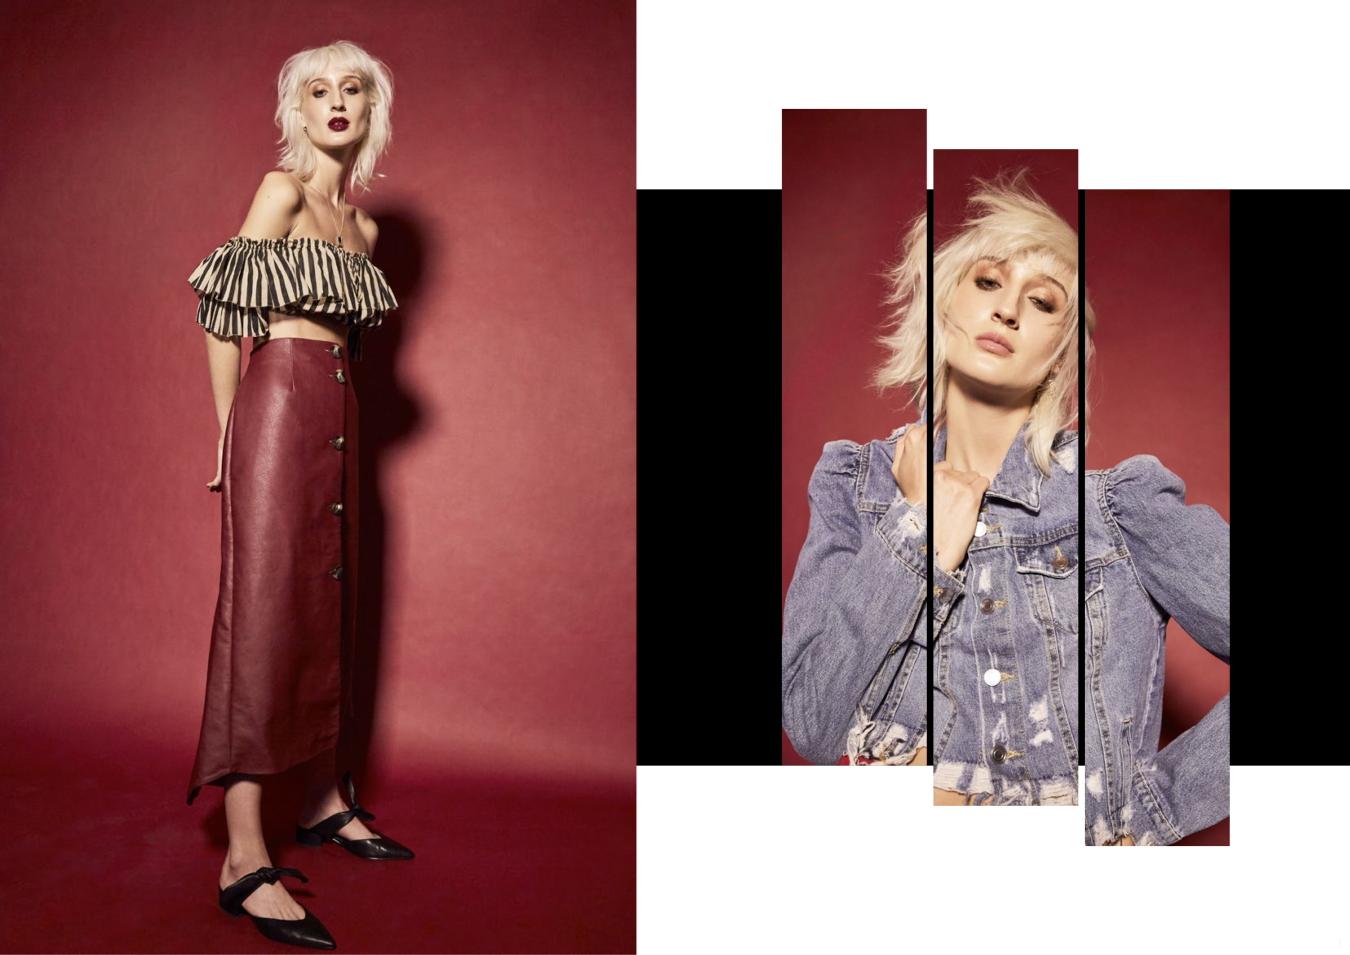 Jacket Zara Earrings Reliquia, Top Zimmermann, Skirt ASOS, Shoes Sol Sana